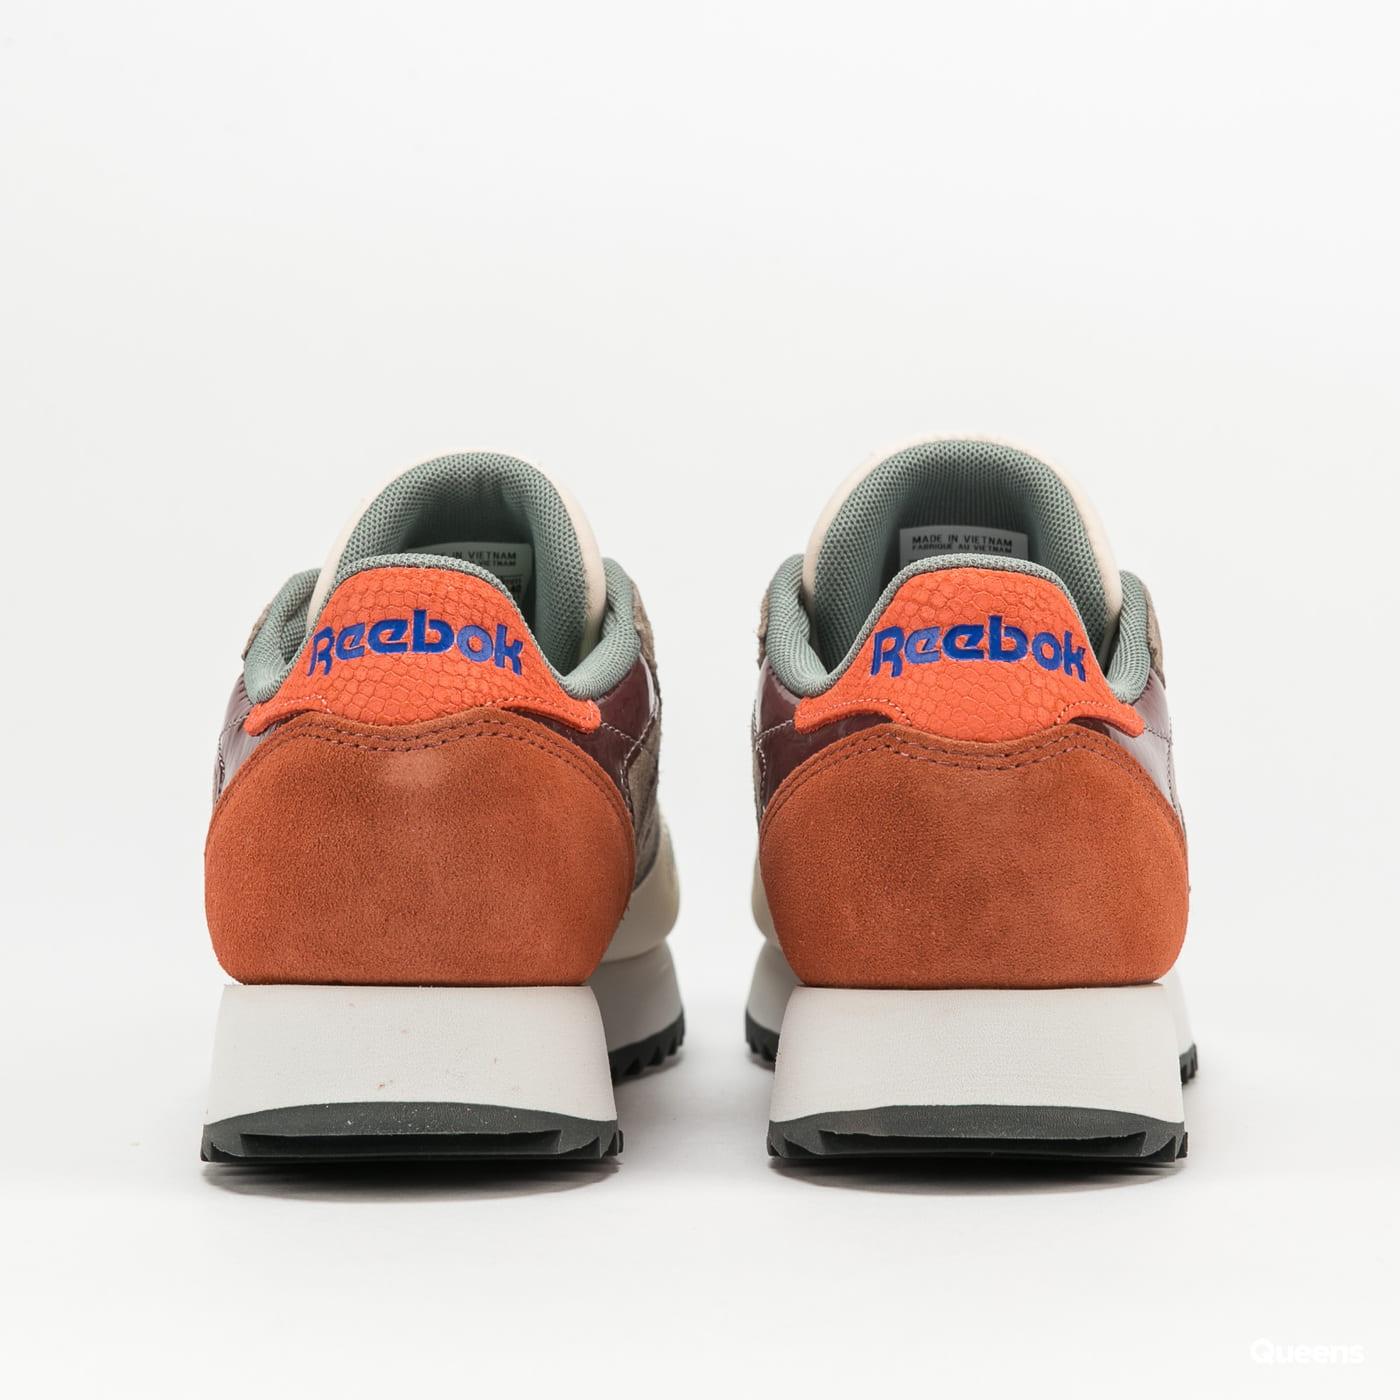 Reebok Classic Leather Ripple cerpnk / bougry / twicor